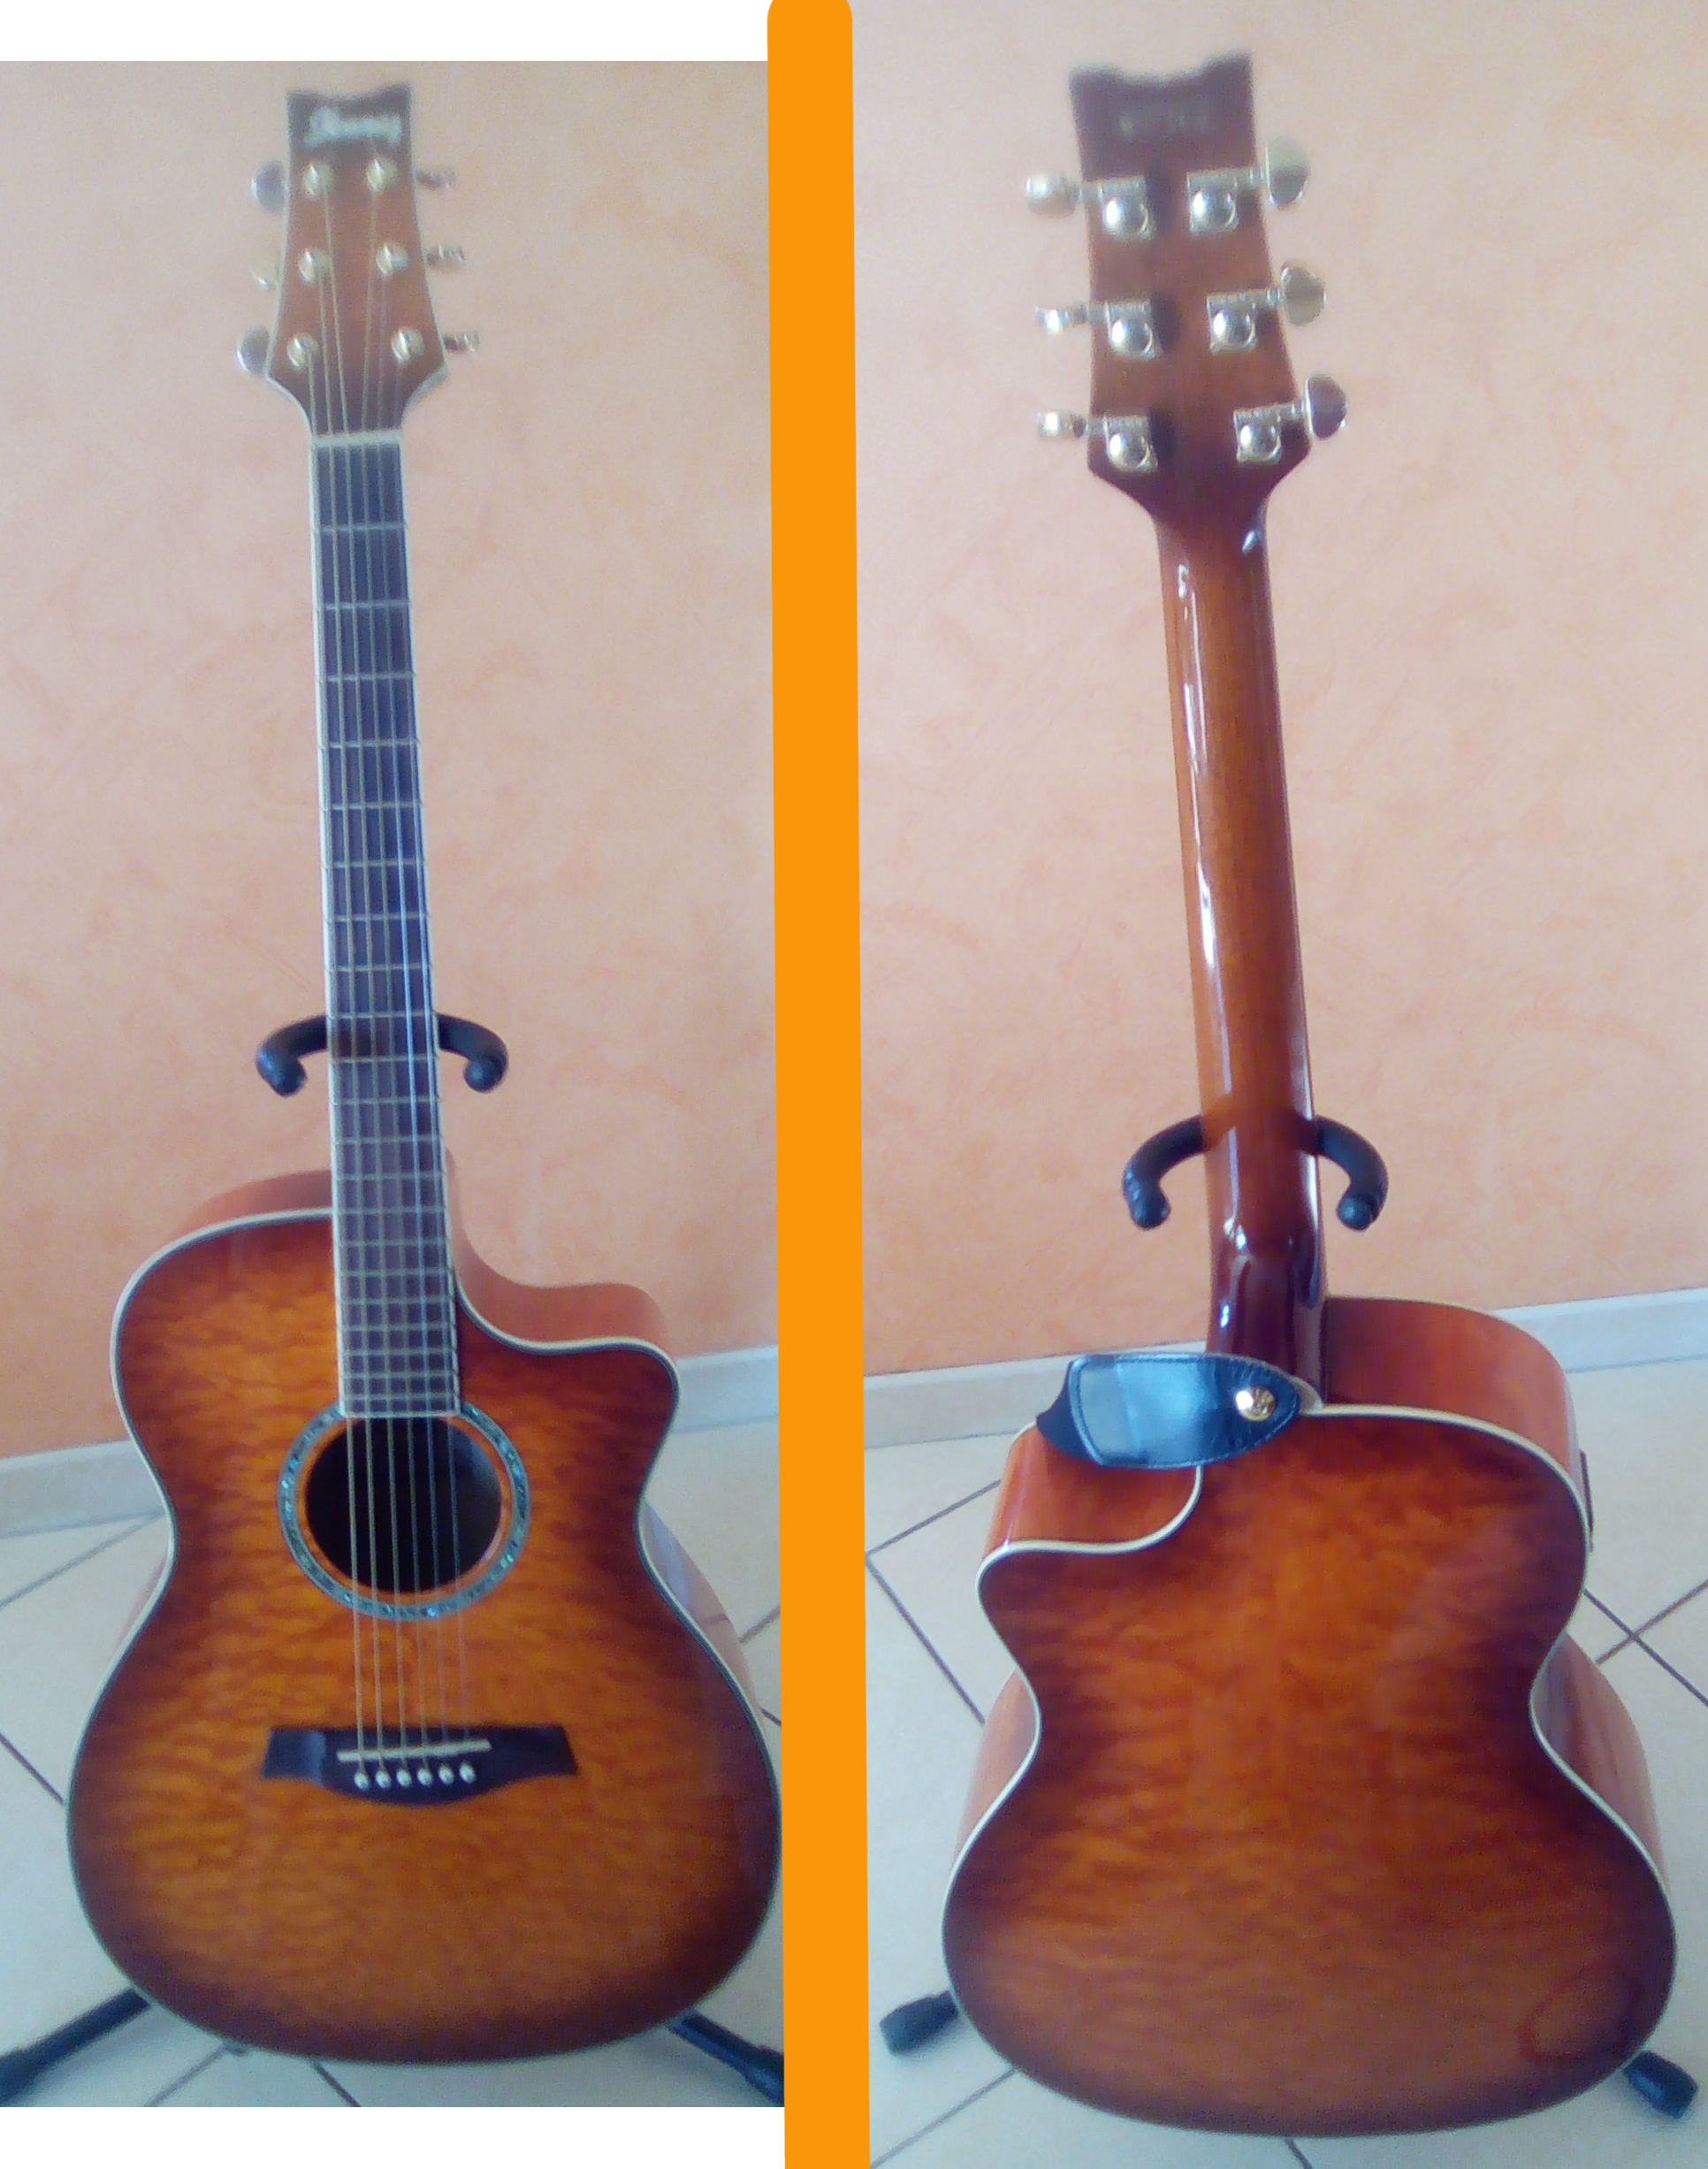 vends guitare lectro acoustique iba ez a300e vv violon. Black Bedroom Furniture Sets. Home Design Ideas